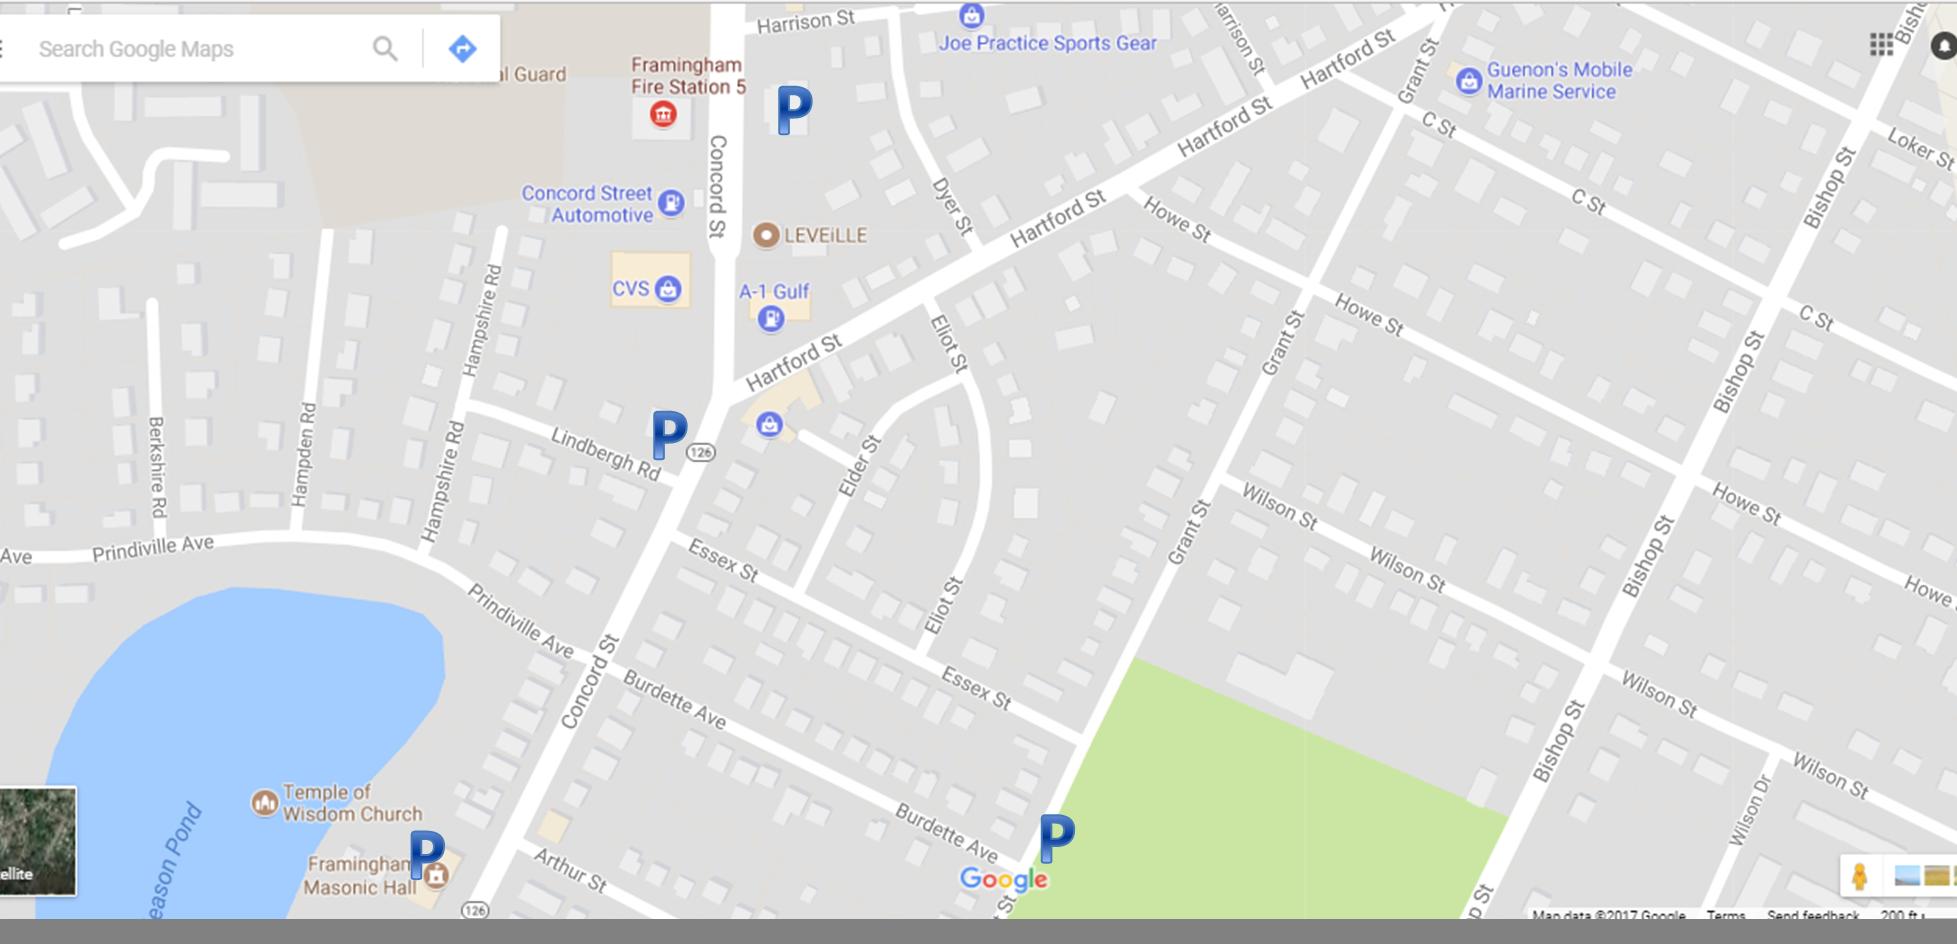 Parking - - On-street - Masonic Hall                (404 Concord Street)- George's Service Station      (472 Concord Street)- Braces Place               (509 Concord Street)- Corner Cabinet              (541 Concord Street)